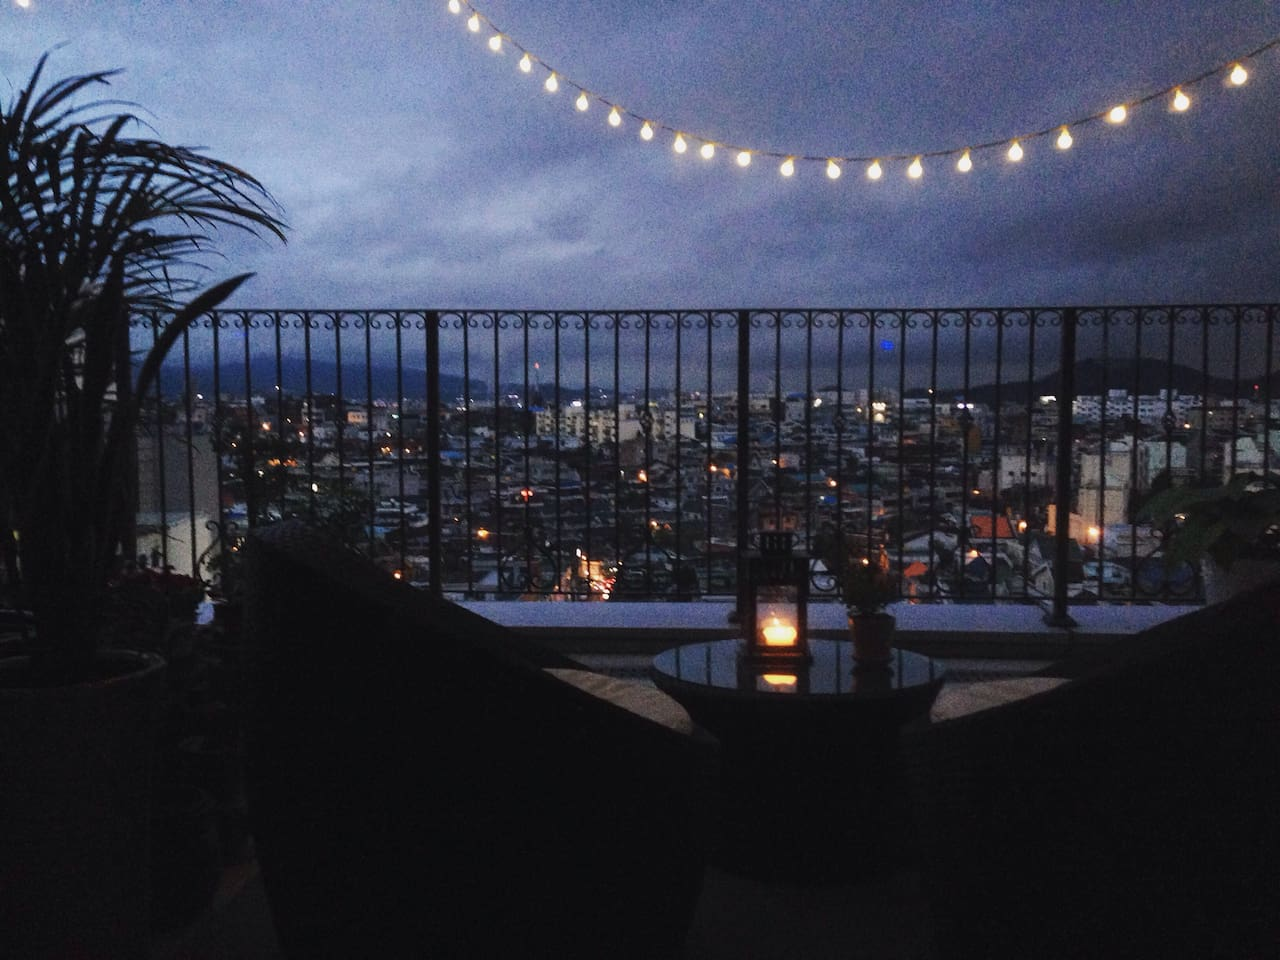 Romantic evening at the balcony